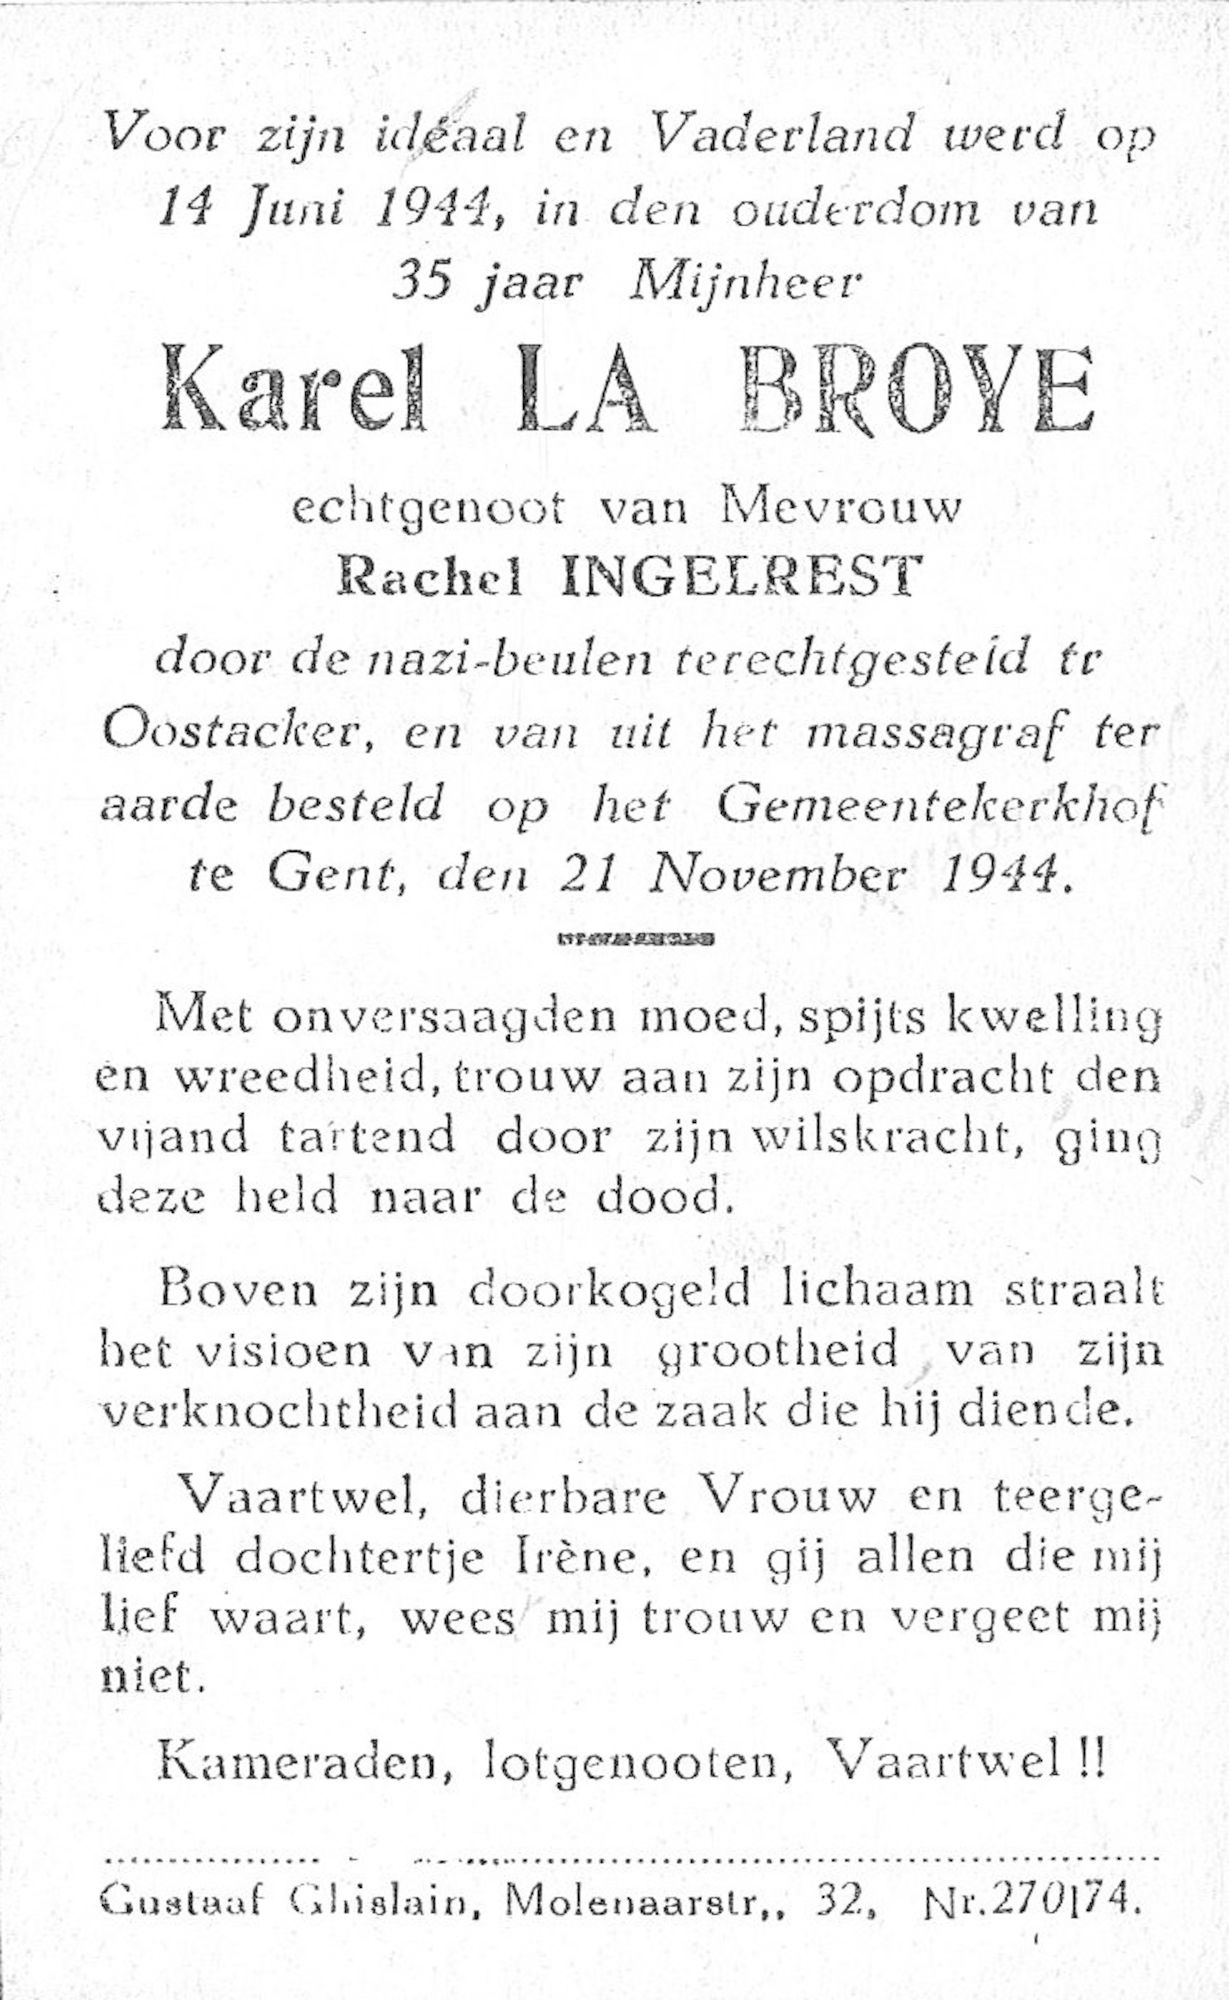 Karel La Broye